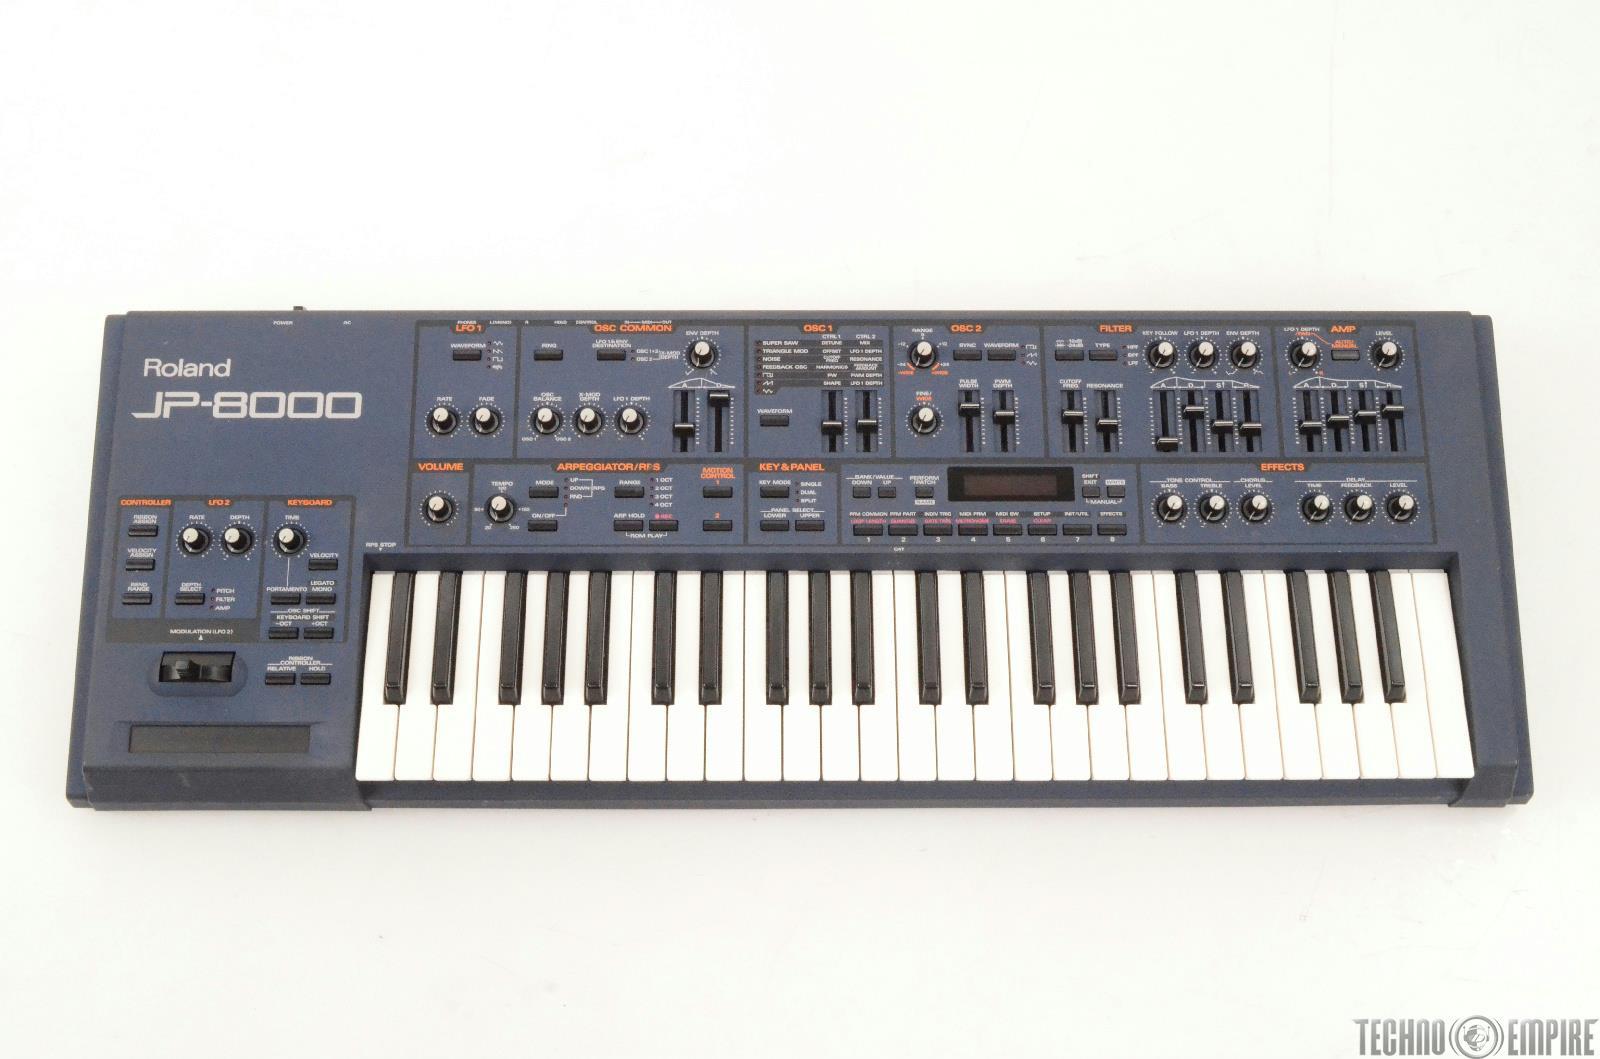 ROLAND JP-8000 Analog Modeling Synthesizer Keyboard NEEDS REPAIR #26301